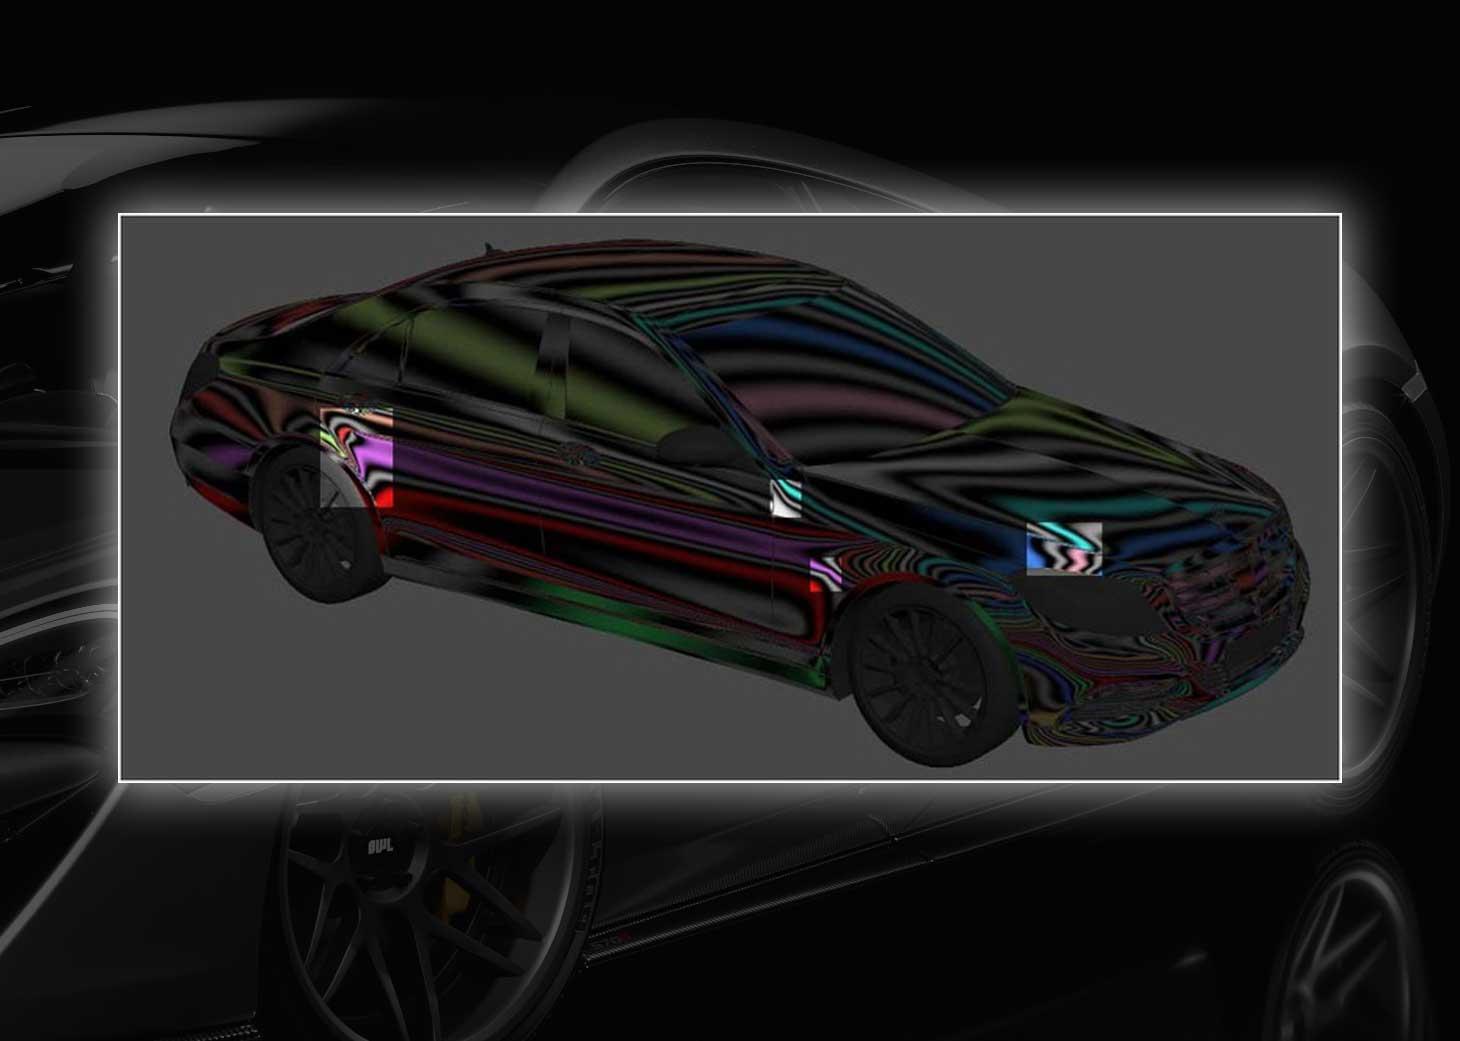 modeling using polygons car 3ds max maya24 - مدلسازی خودرو در تری دی مکس